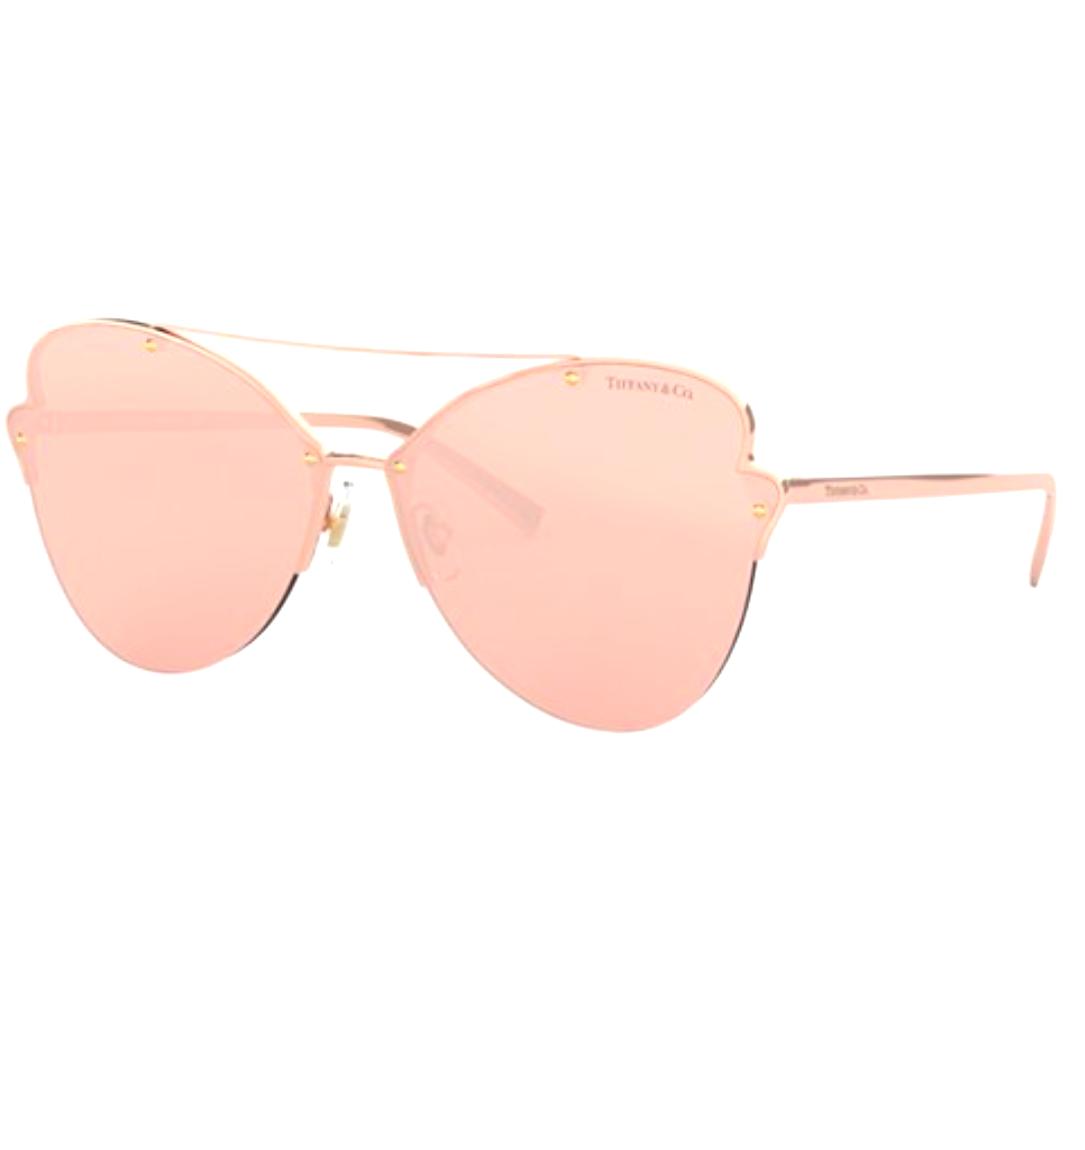 Tiffany & Co - TF3063 6105E0 64 - Óculos de Sol